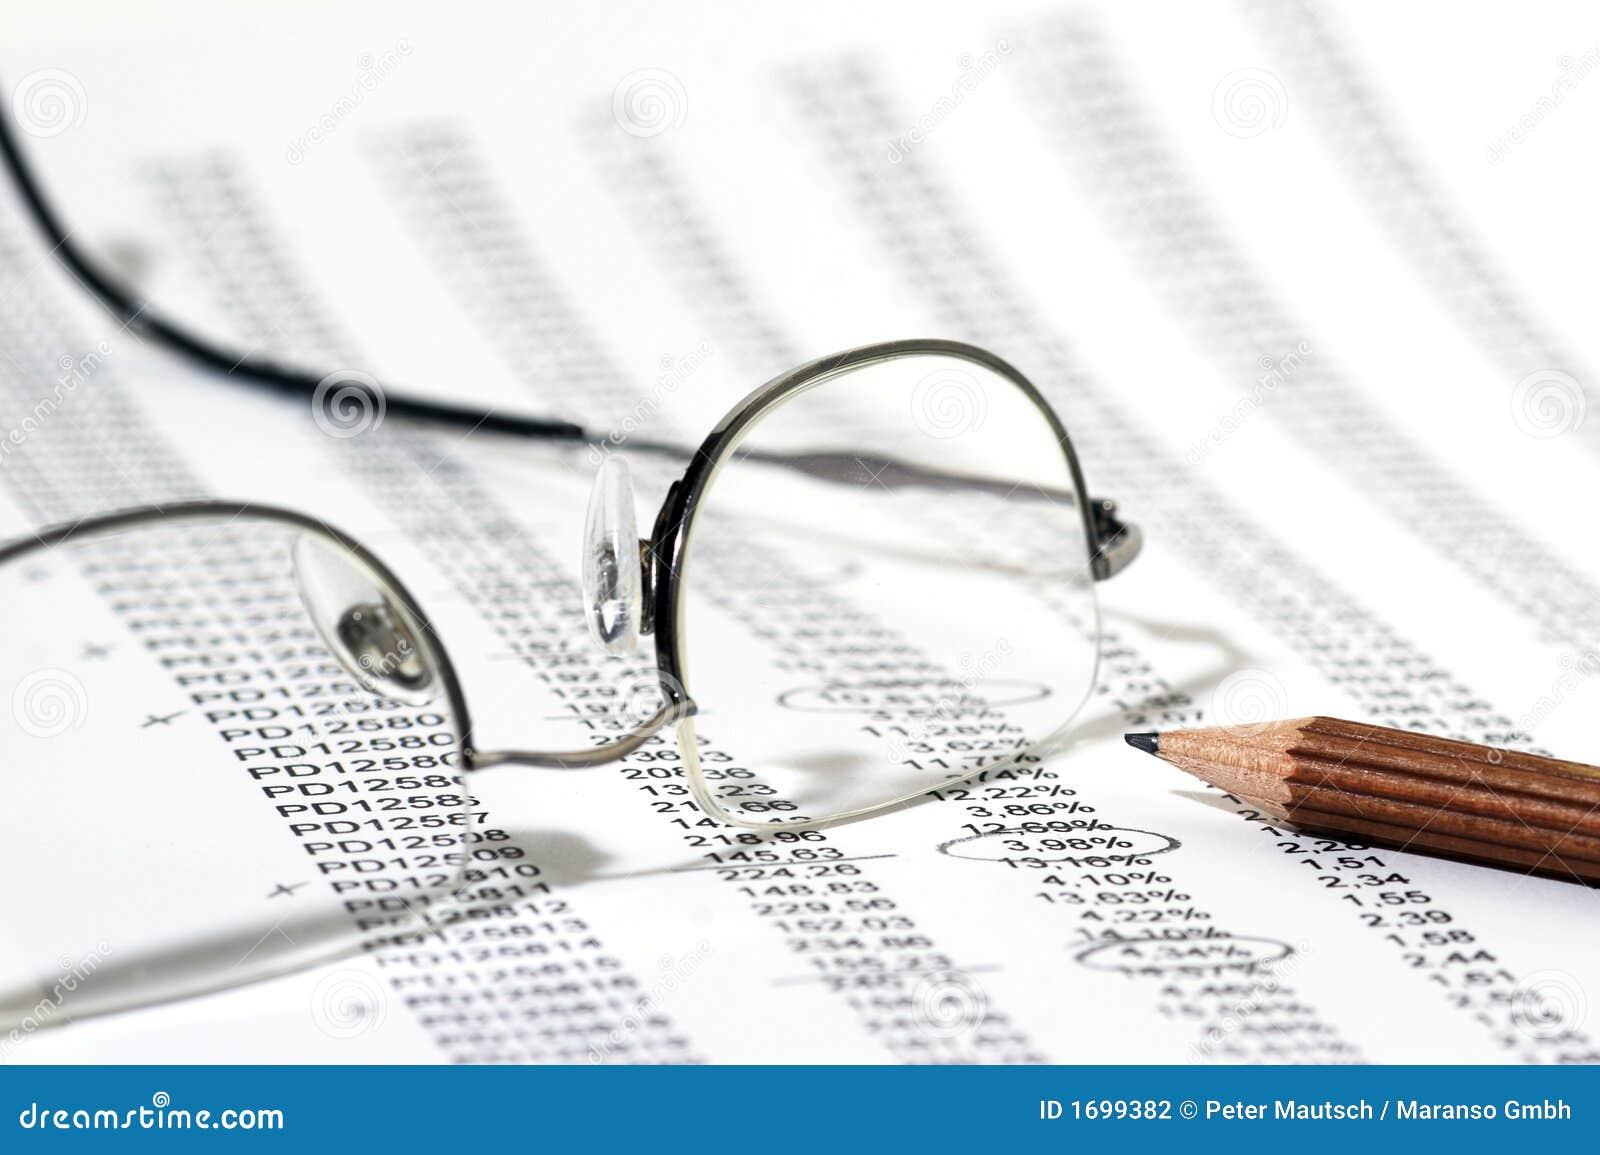 data analysis and interpretation of stock exchange Foreword and interpretation 13 quantitative analysis, fund administration london stock exchange data uk market data.